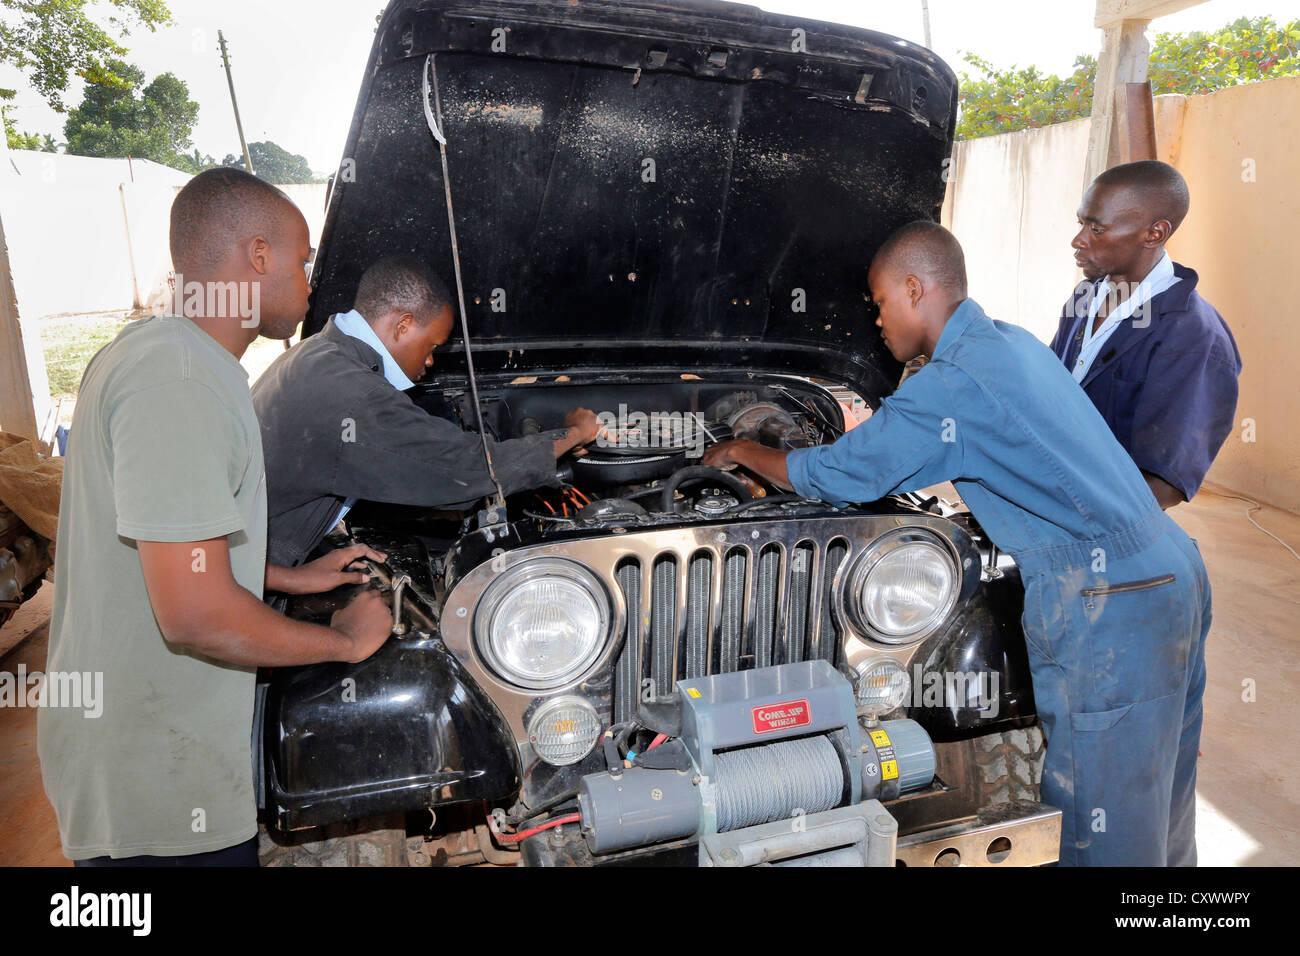 young mechanics works on a car engine. Machui Vocational Center, Machui, Zanzibar, Tanzania Stock Photo